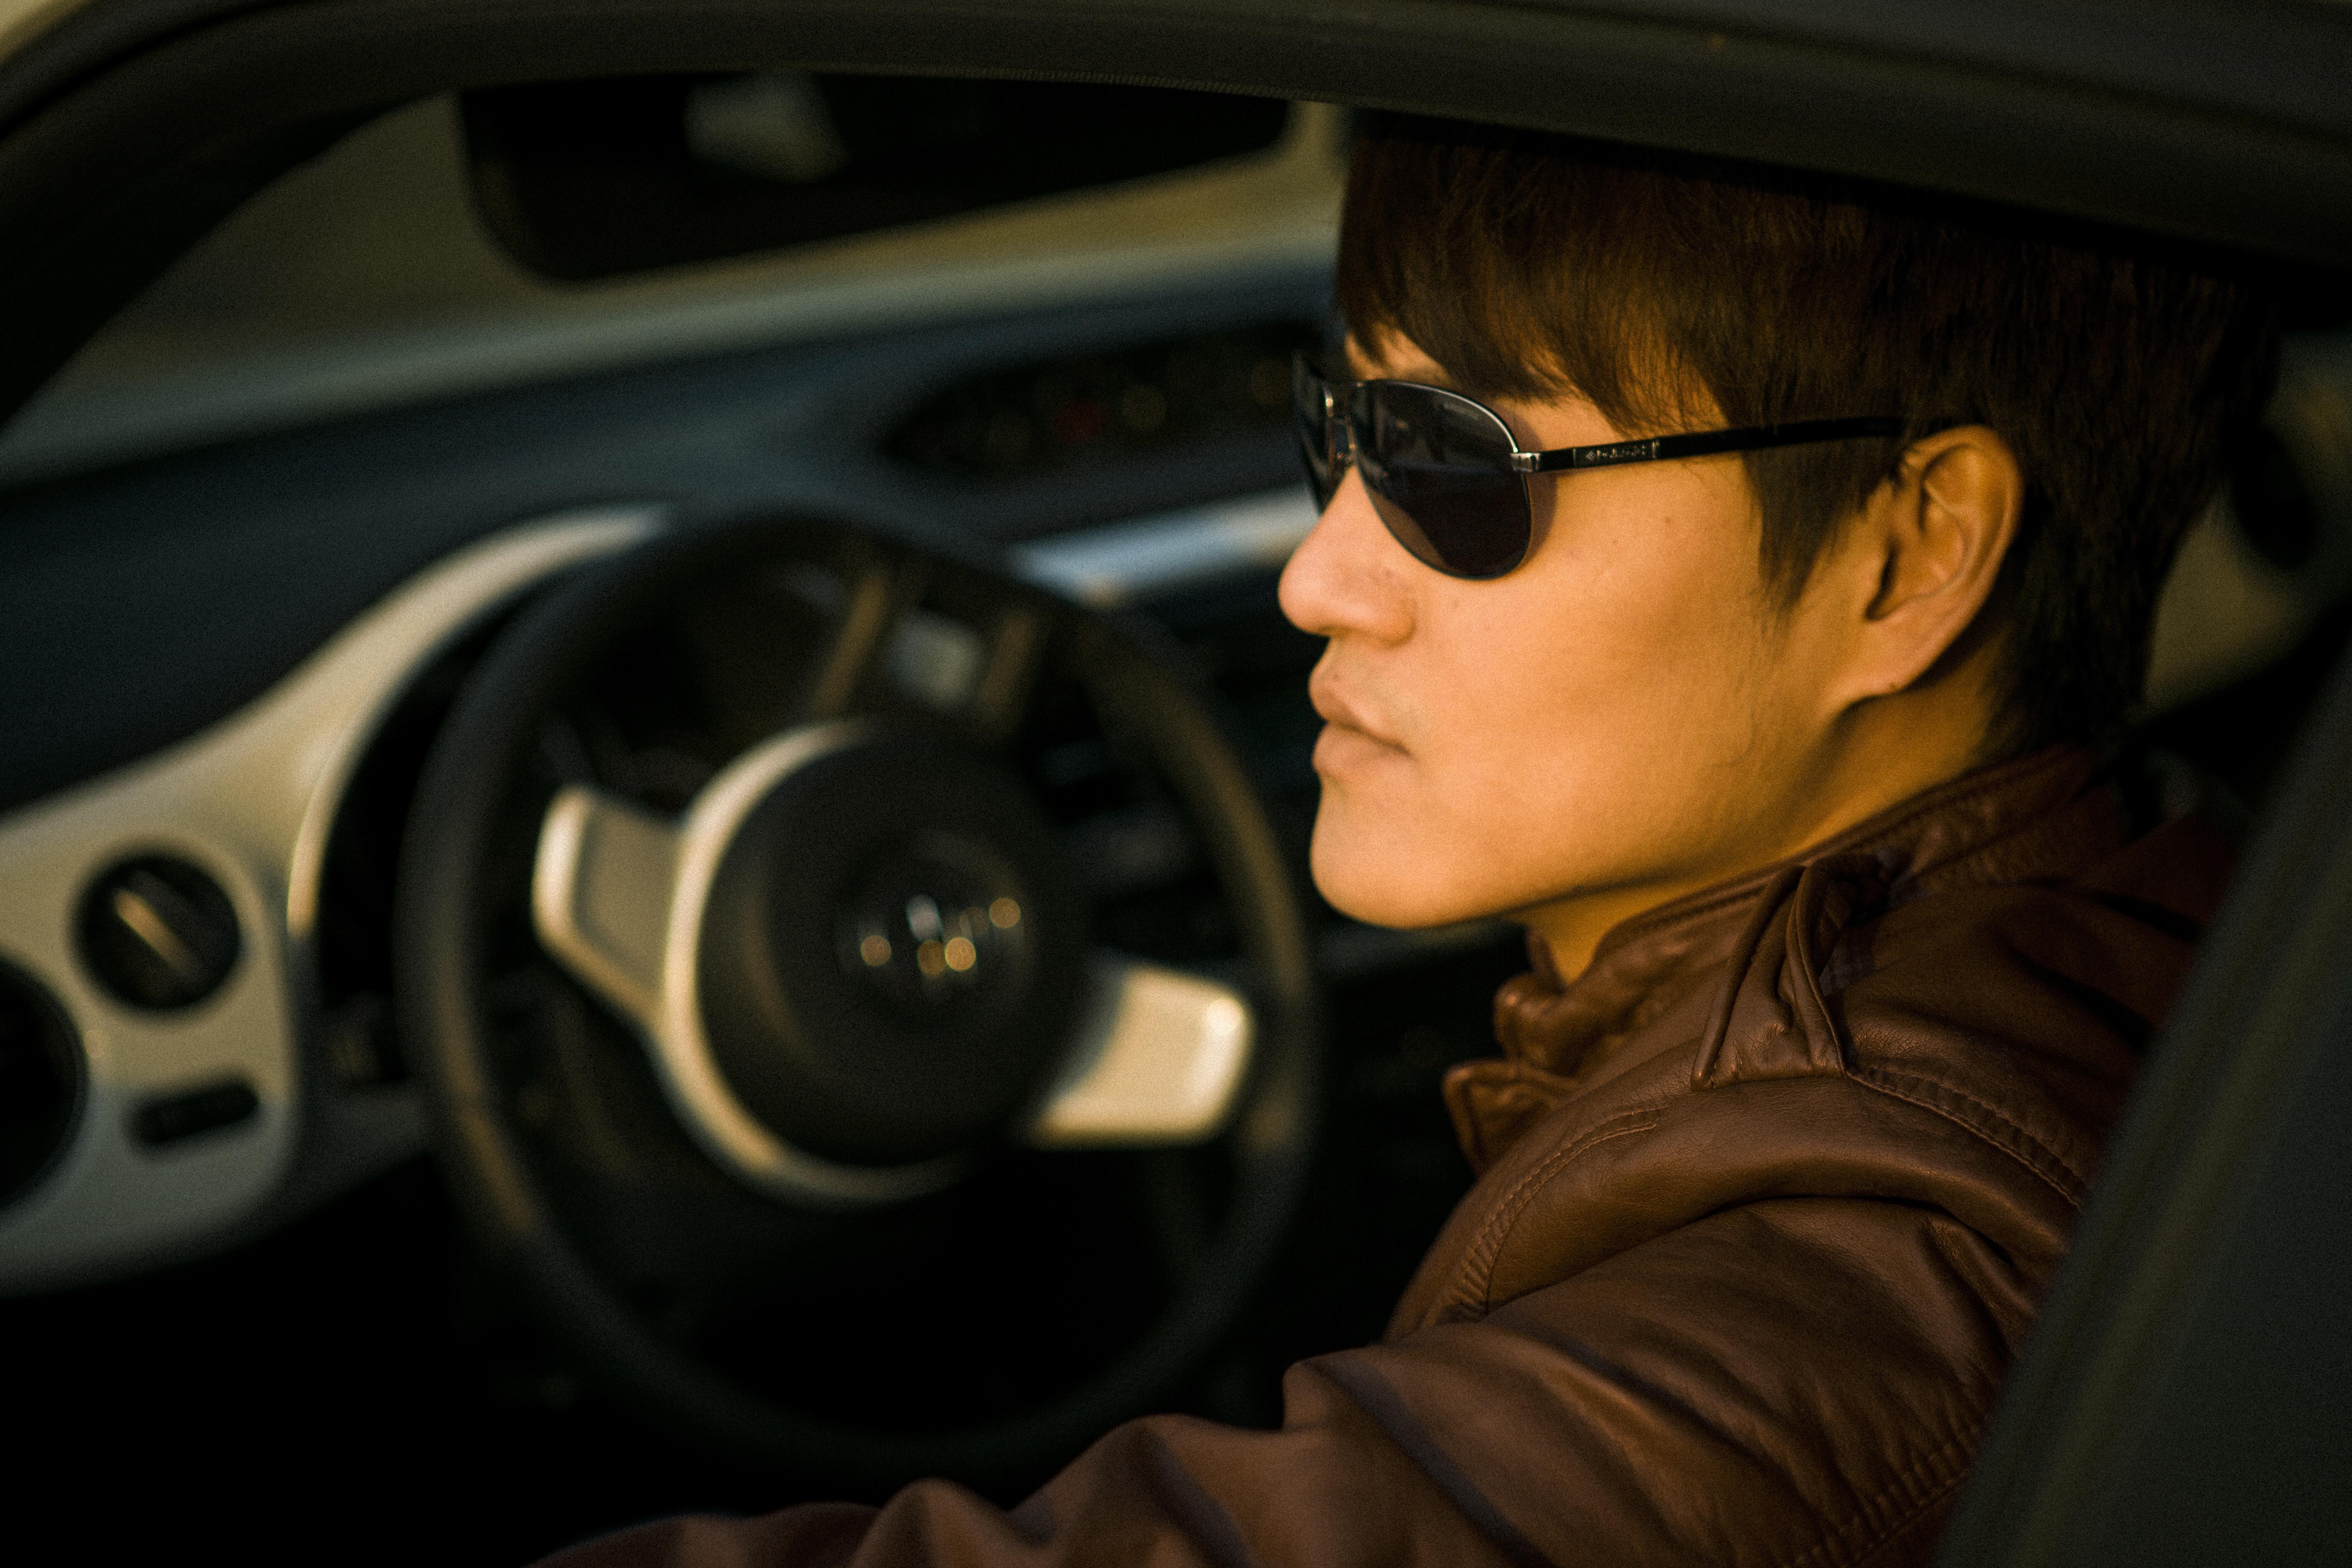 Man wearing sunglasses sitting on driver's seat photo